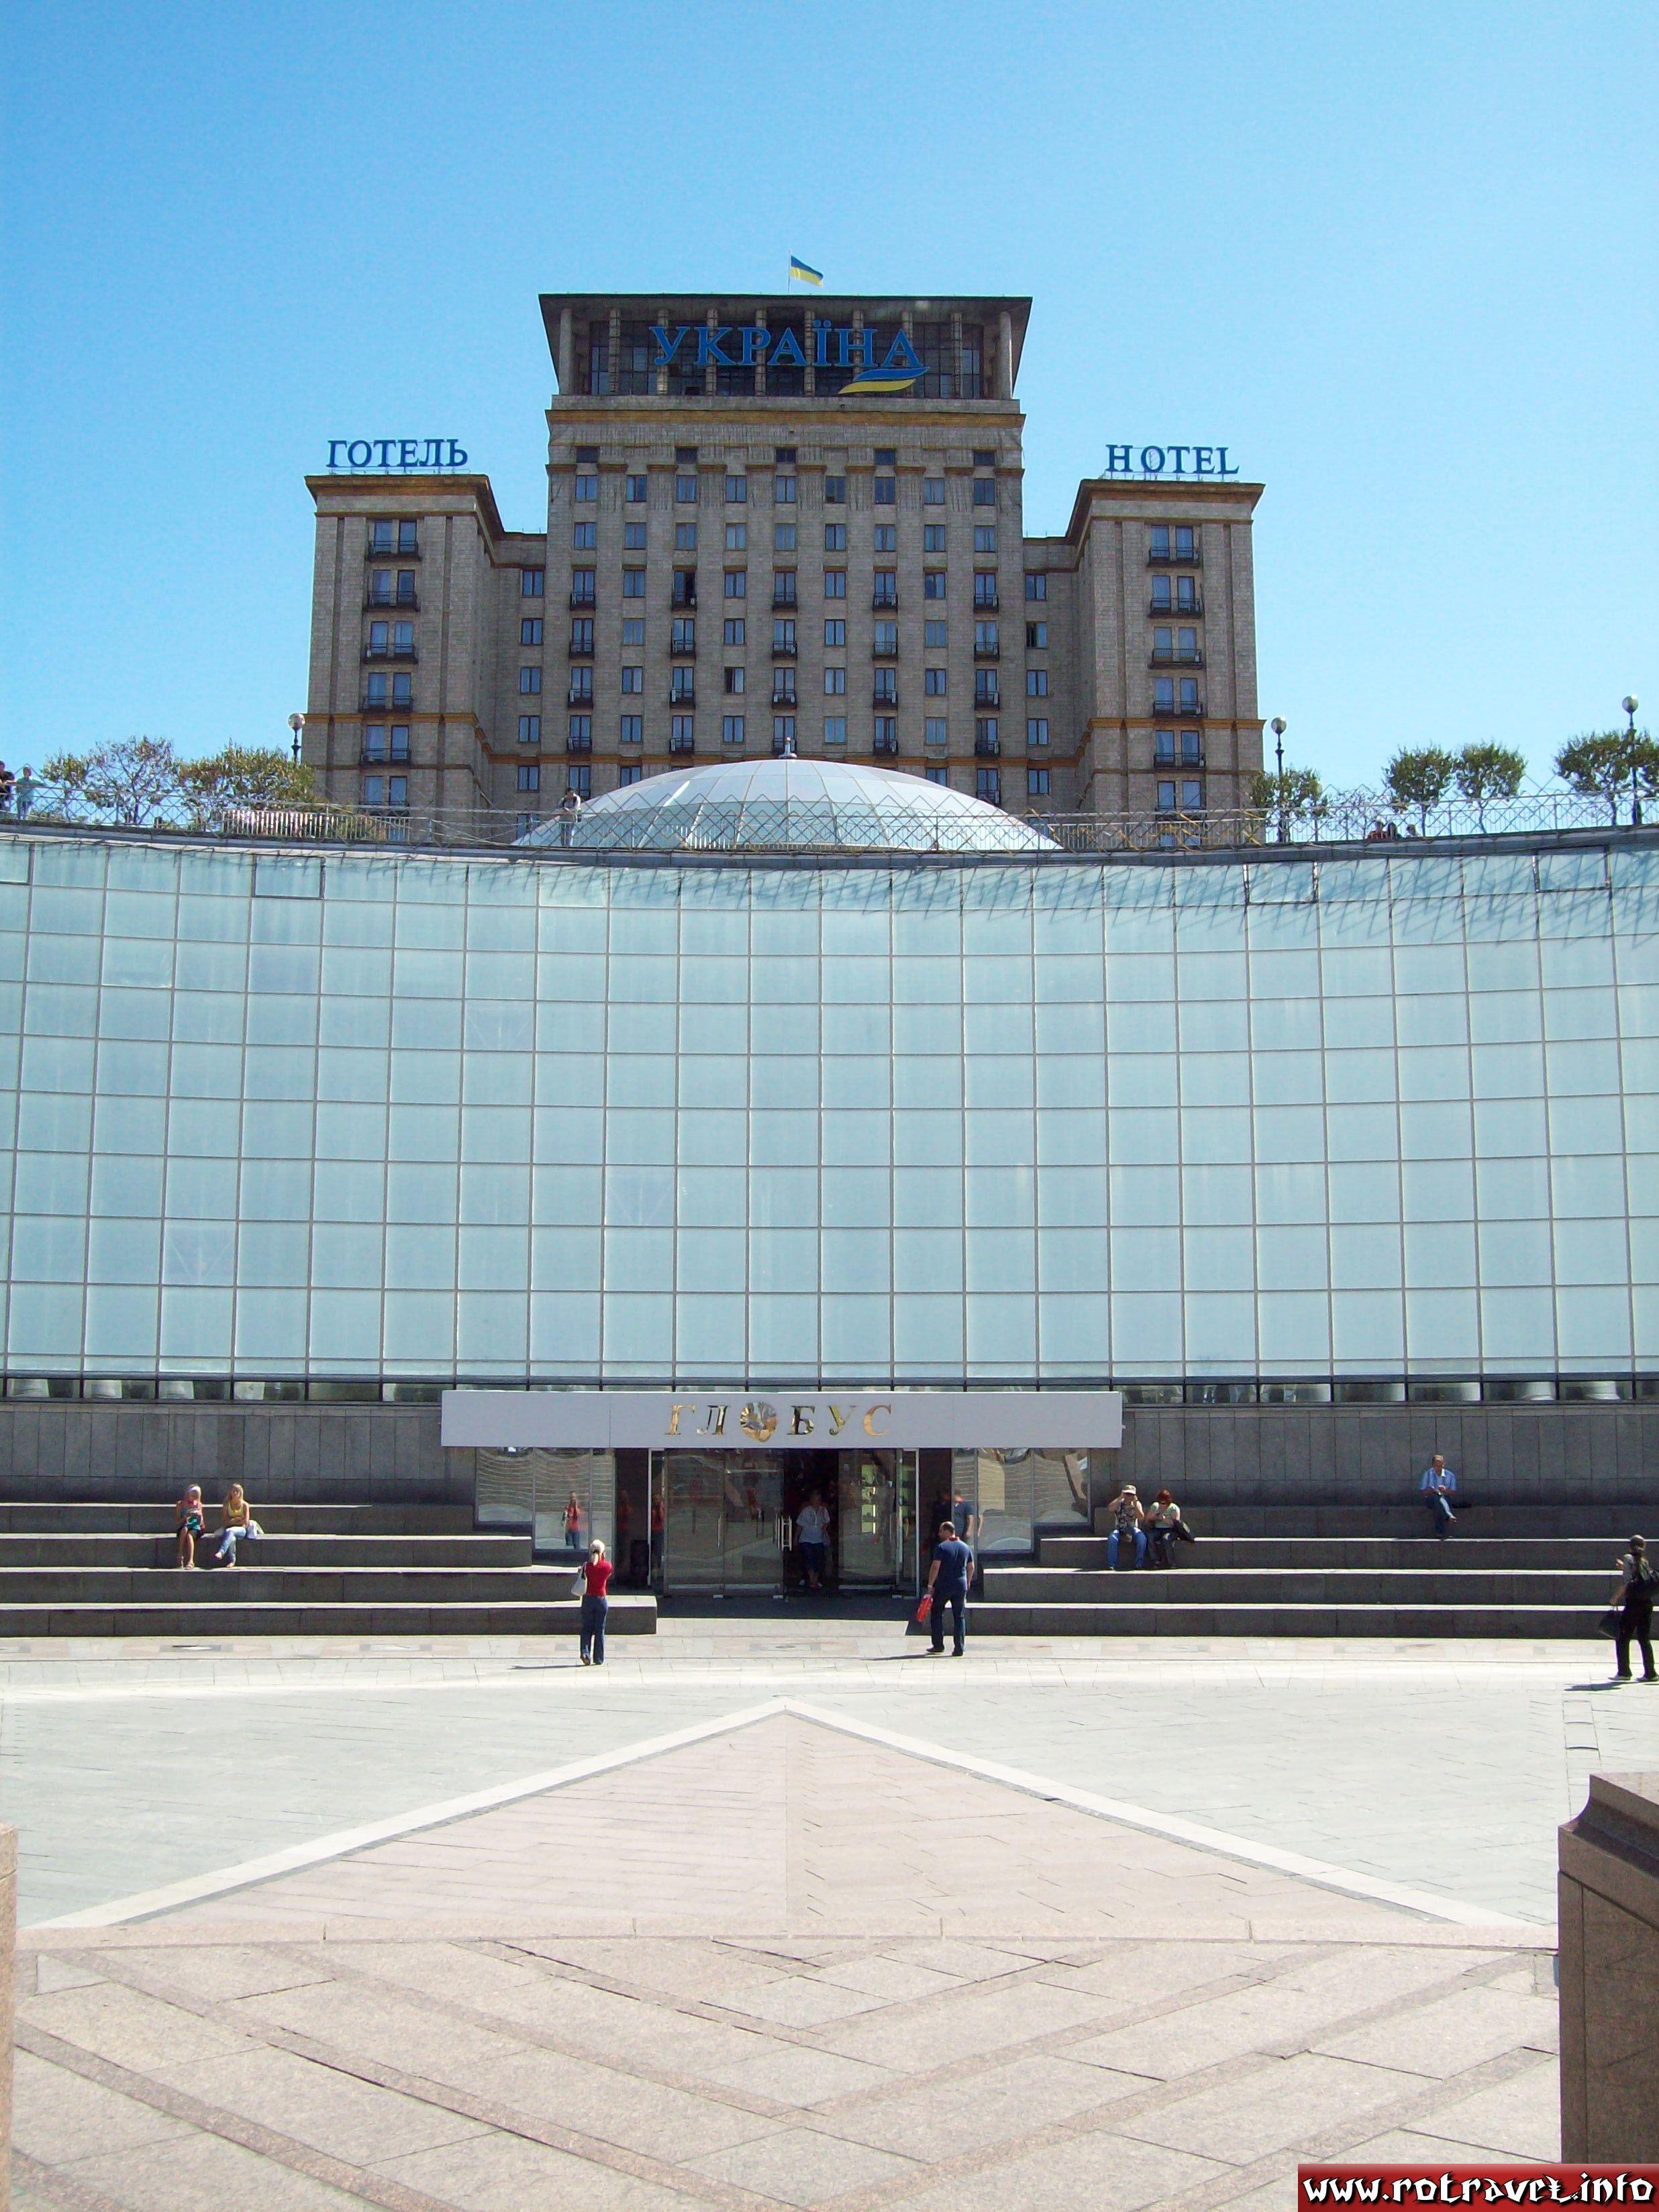 Hotel Ukraina (Ukrainian: Готель Україна; Russian: Гостиница Украина) from the Independence Square